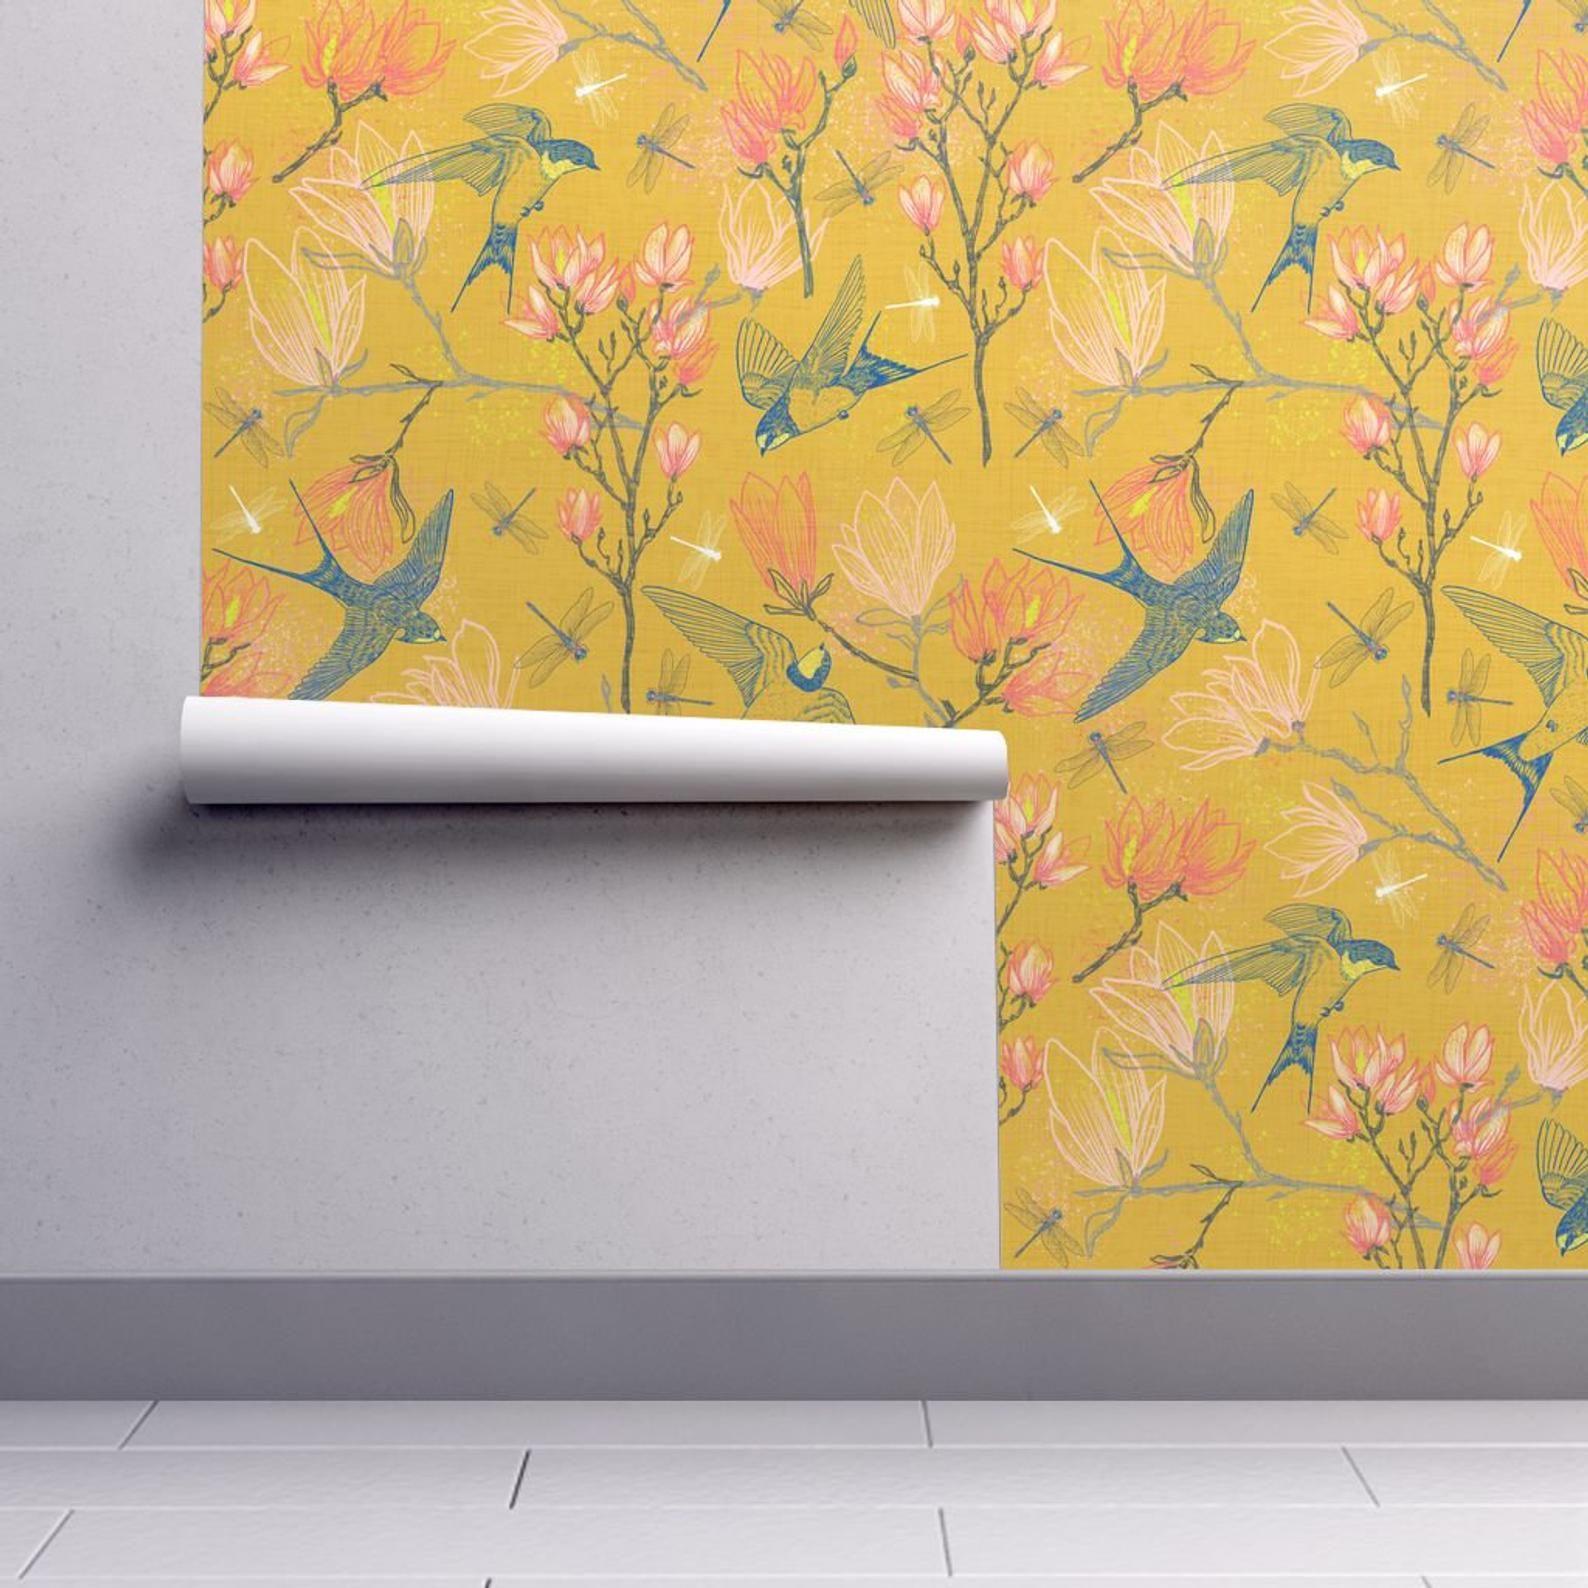 Swallows Wallpaper Golden Summer Magnolias By Helenpdesigns Etsy Self Adhesive Wallpaper Removable Wallpaper Wallpaper